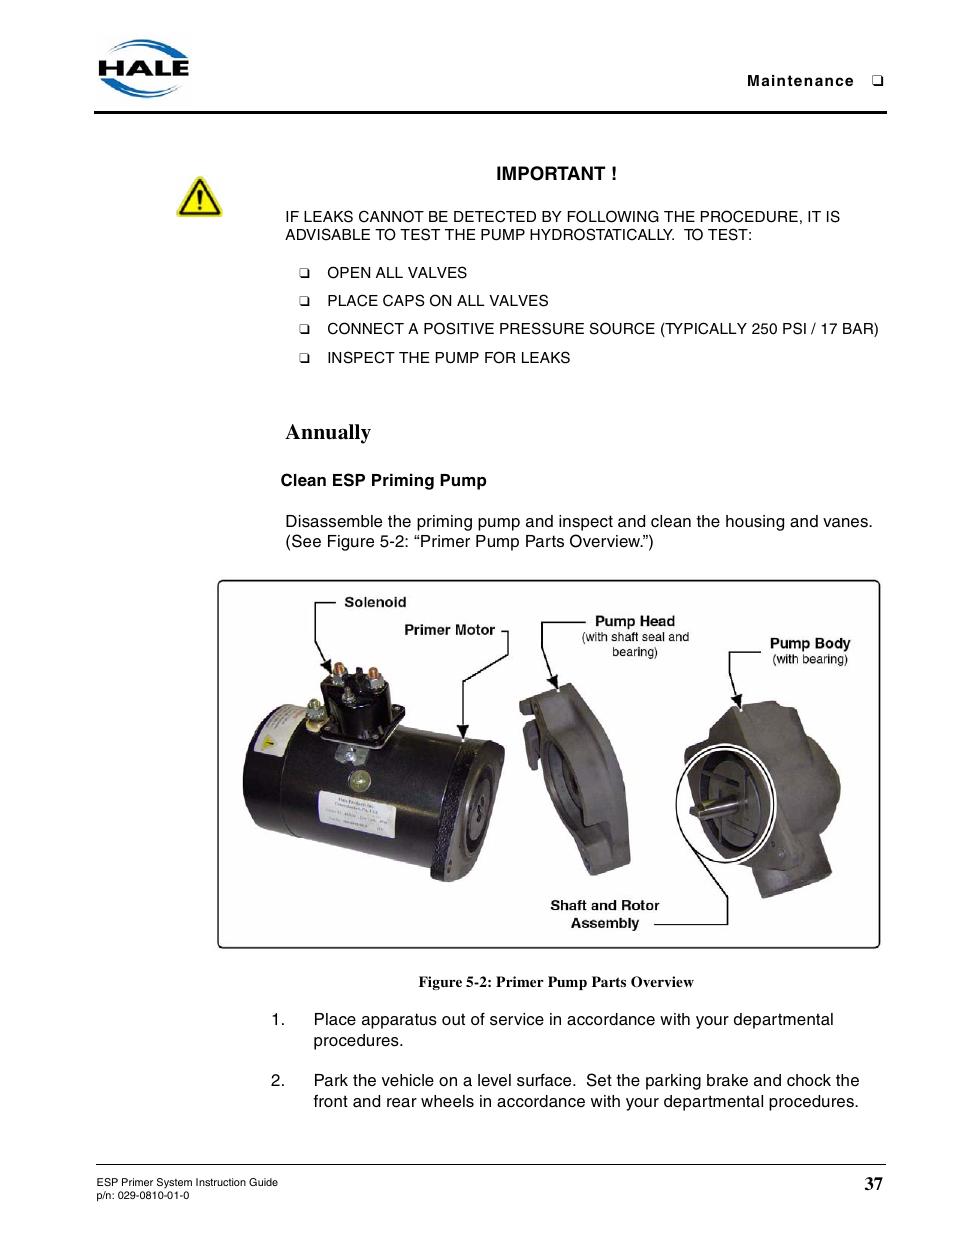 annually, clean esp priming pump, figure 5-2: primer pump parts overview |  hale esp priming system user manual | page 37 / 70